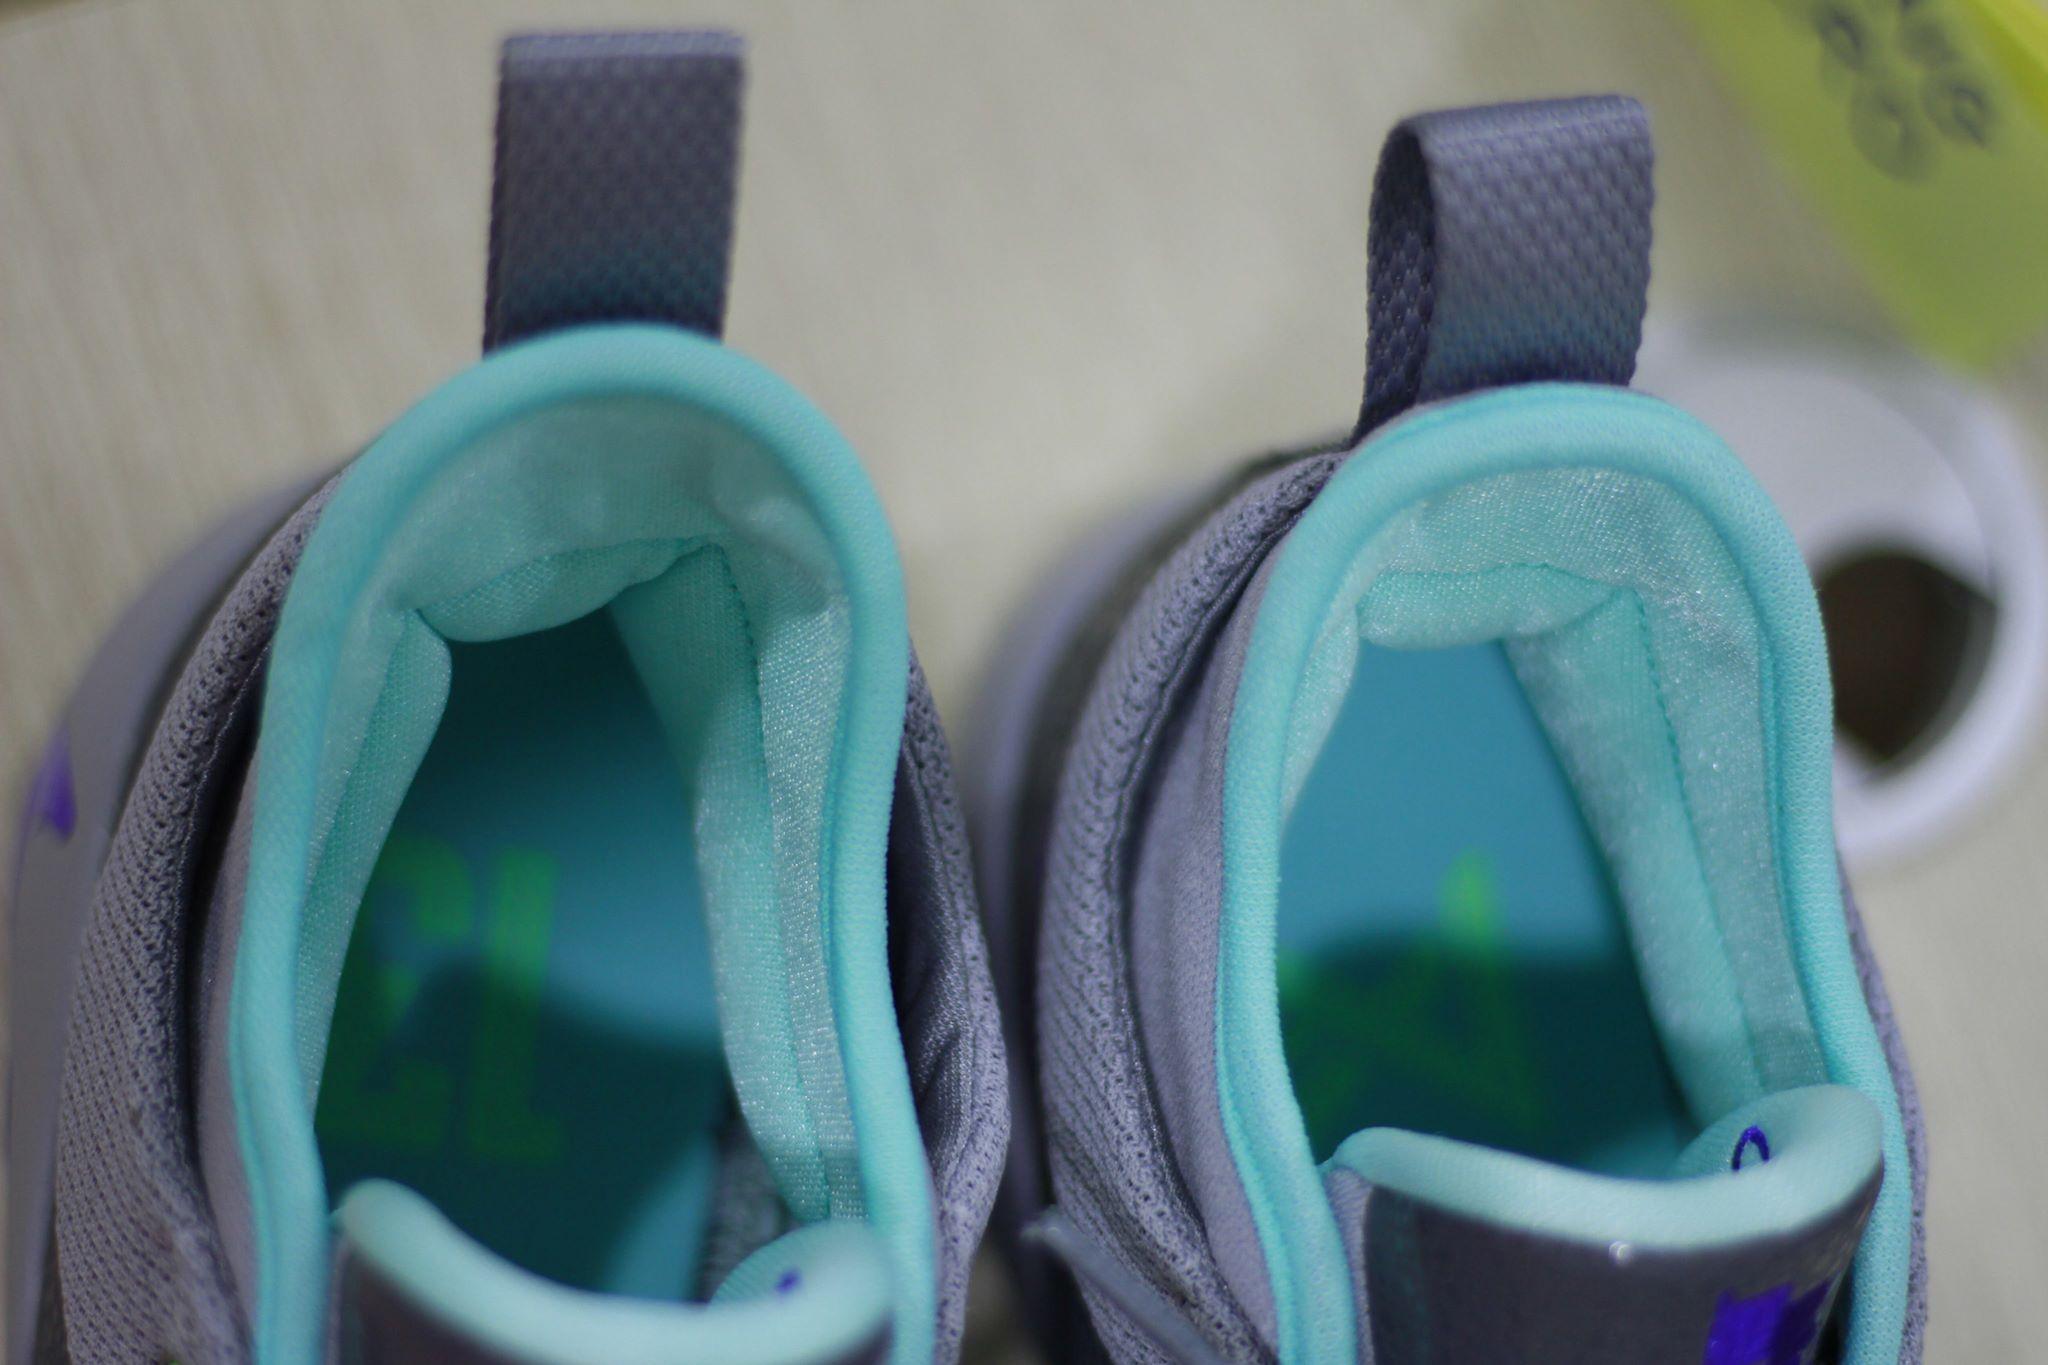 Nike PG 2 pure platinum ankle